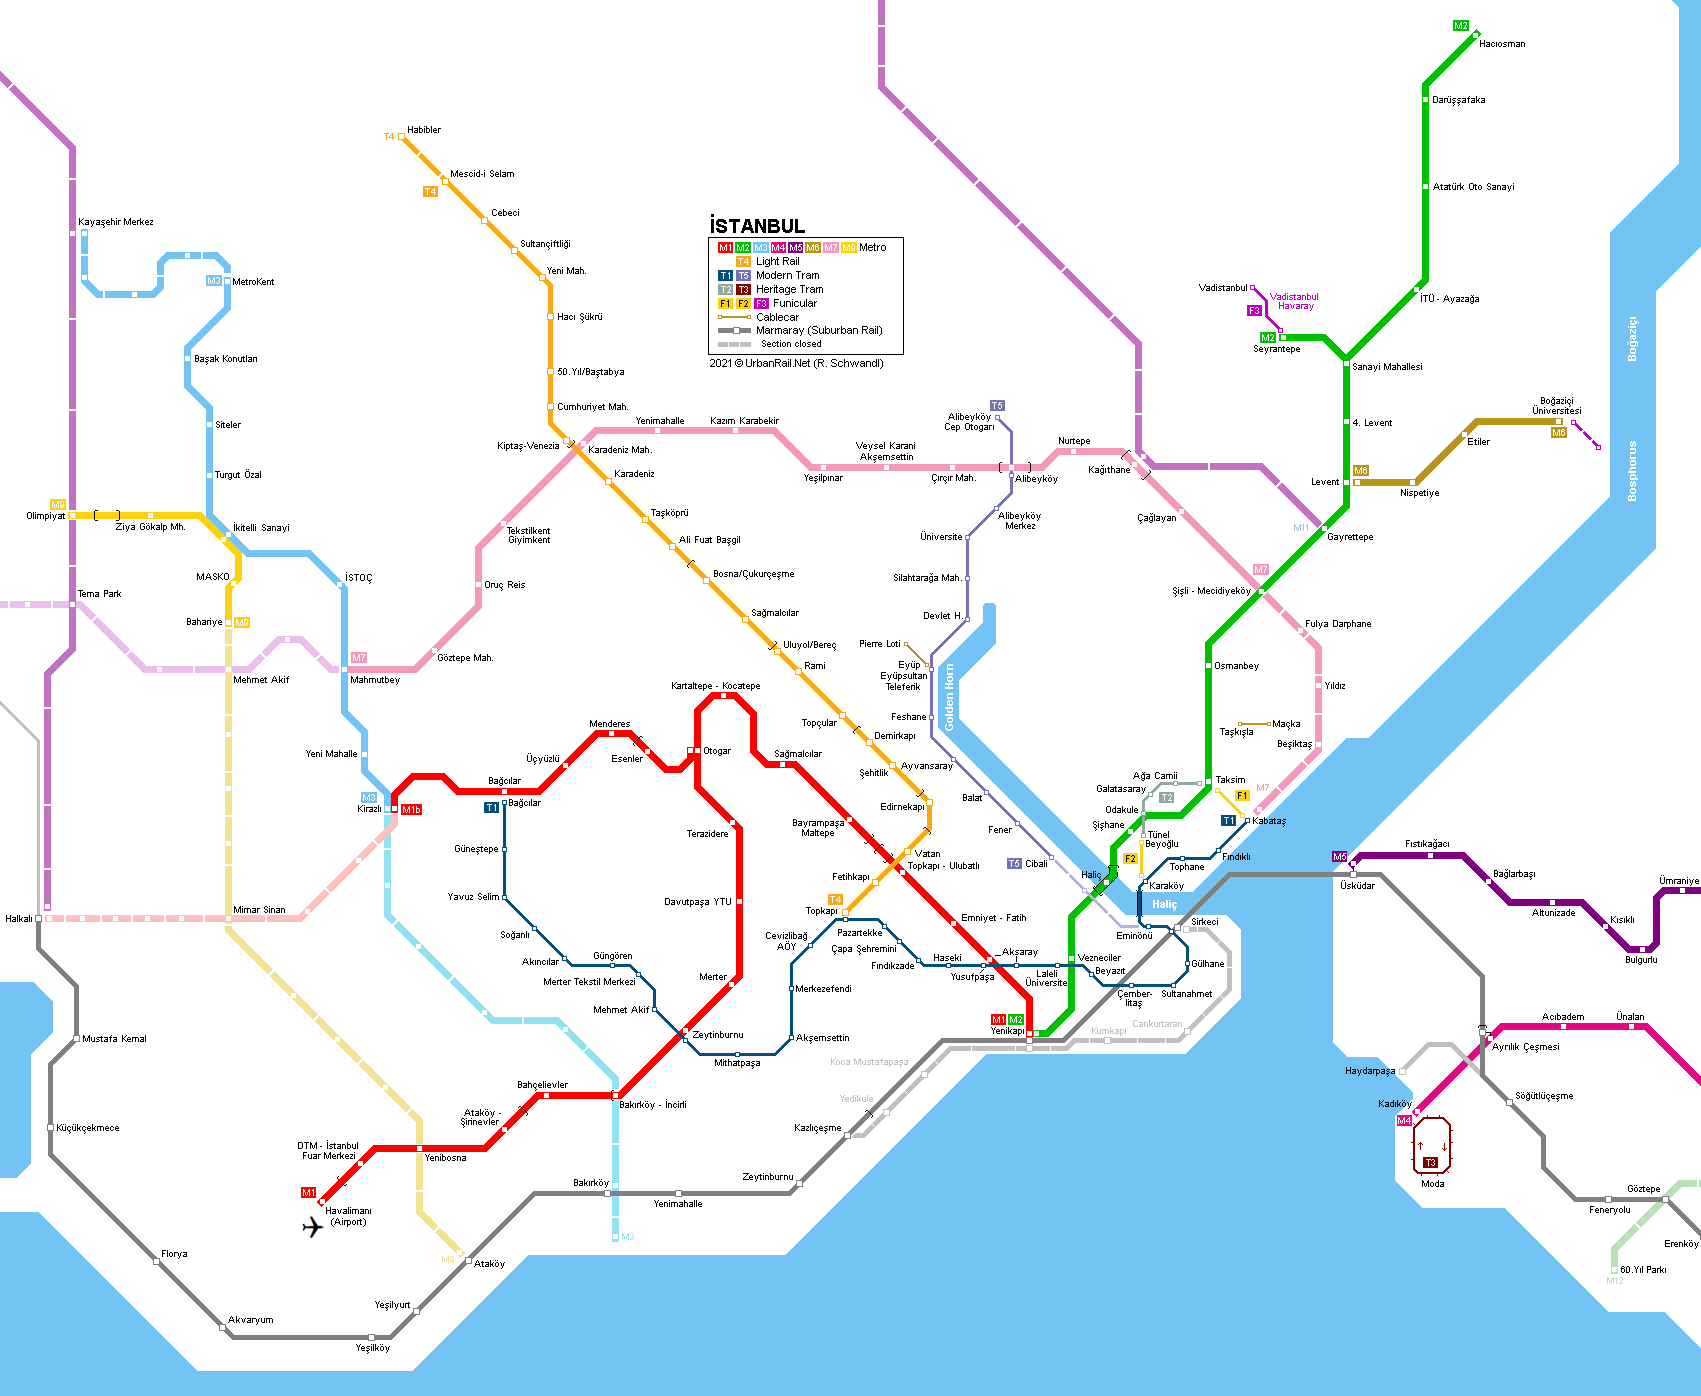 Istanbul Subway Map 2015.Urbanrail Net Europe Turkey Istanbul Metro